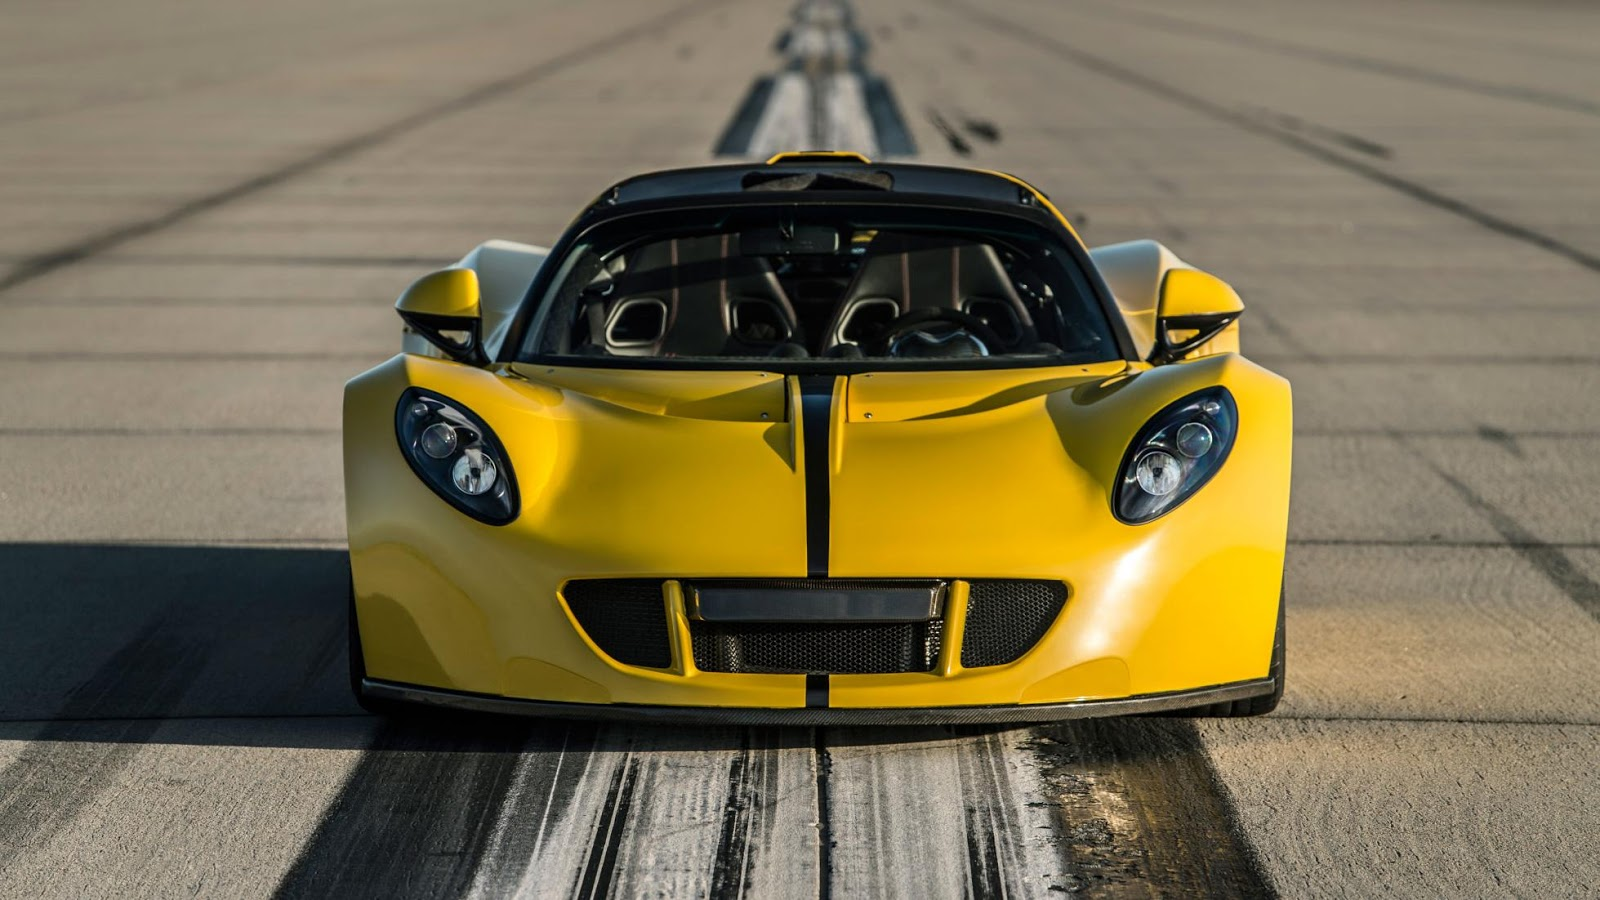 Siêu xe Hennessey Venom GT Spyder đạt tốc độ 427,5 km/h